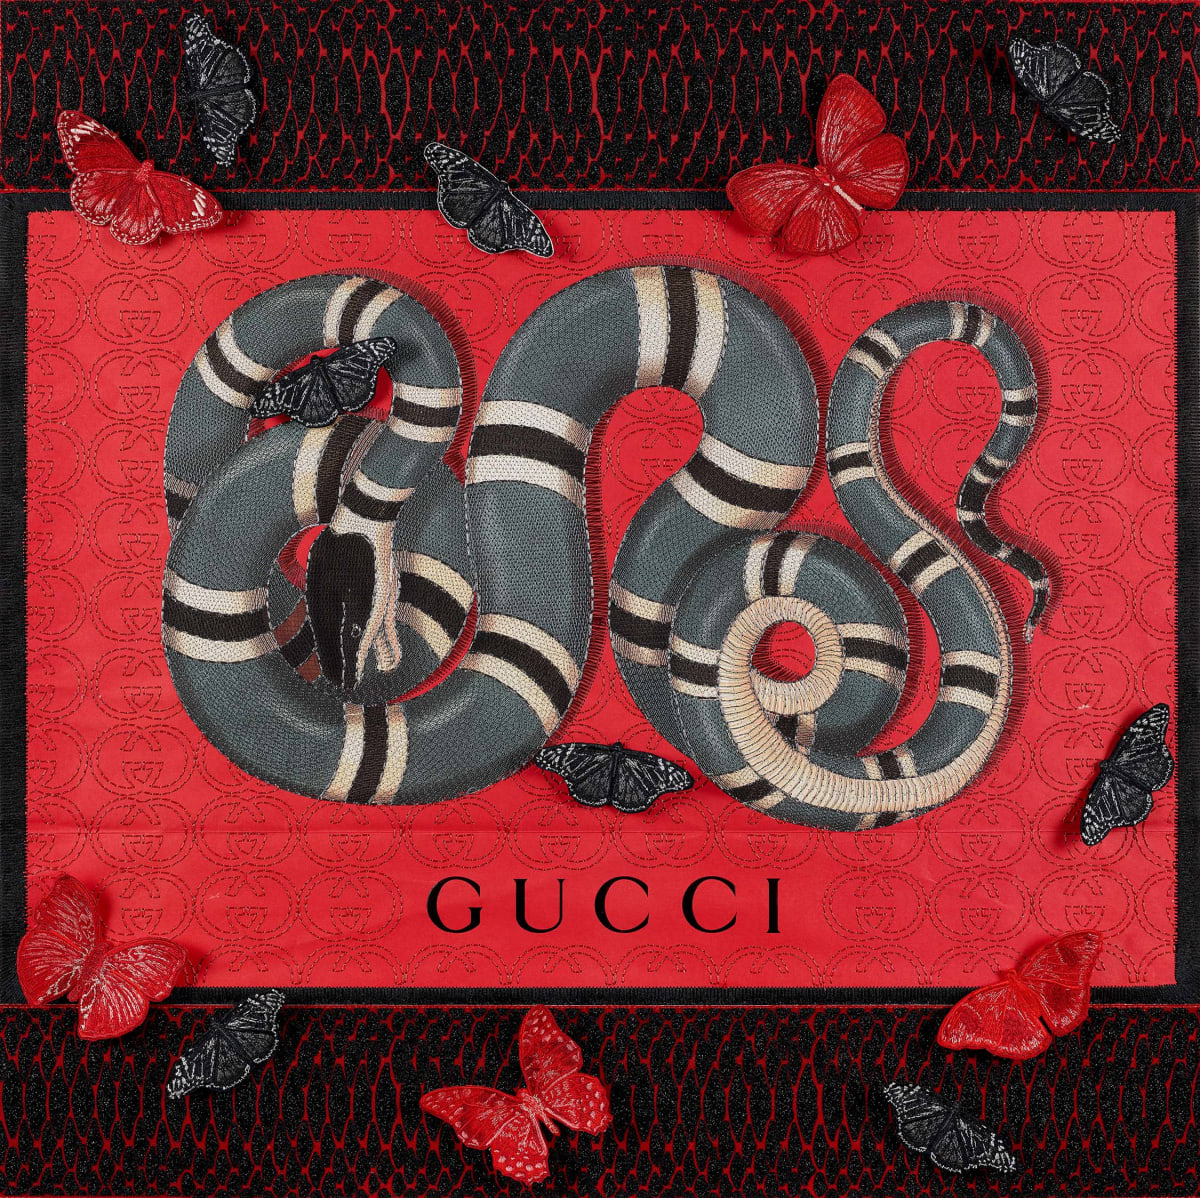 Stephen Wilson, Gucci Snake Tracks Variation, 2020